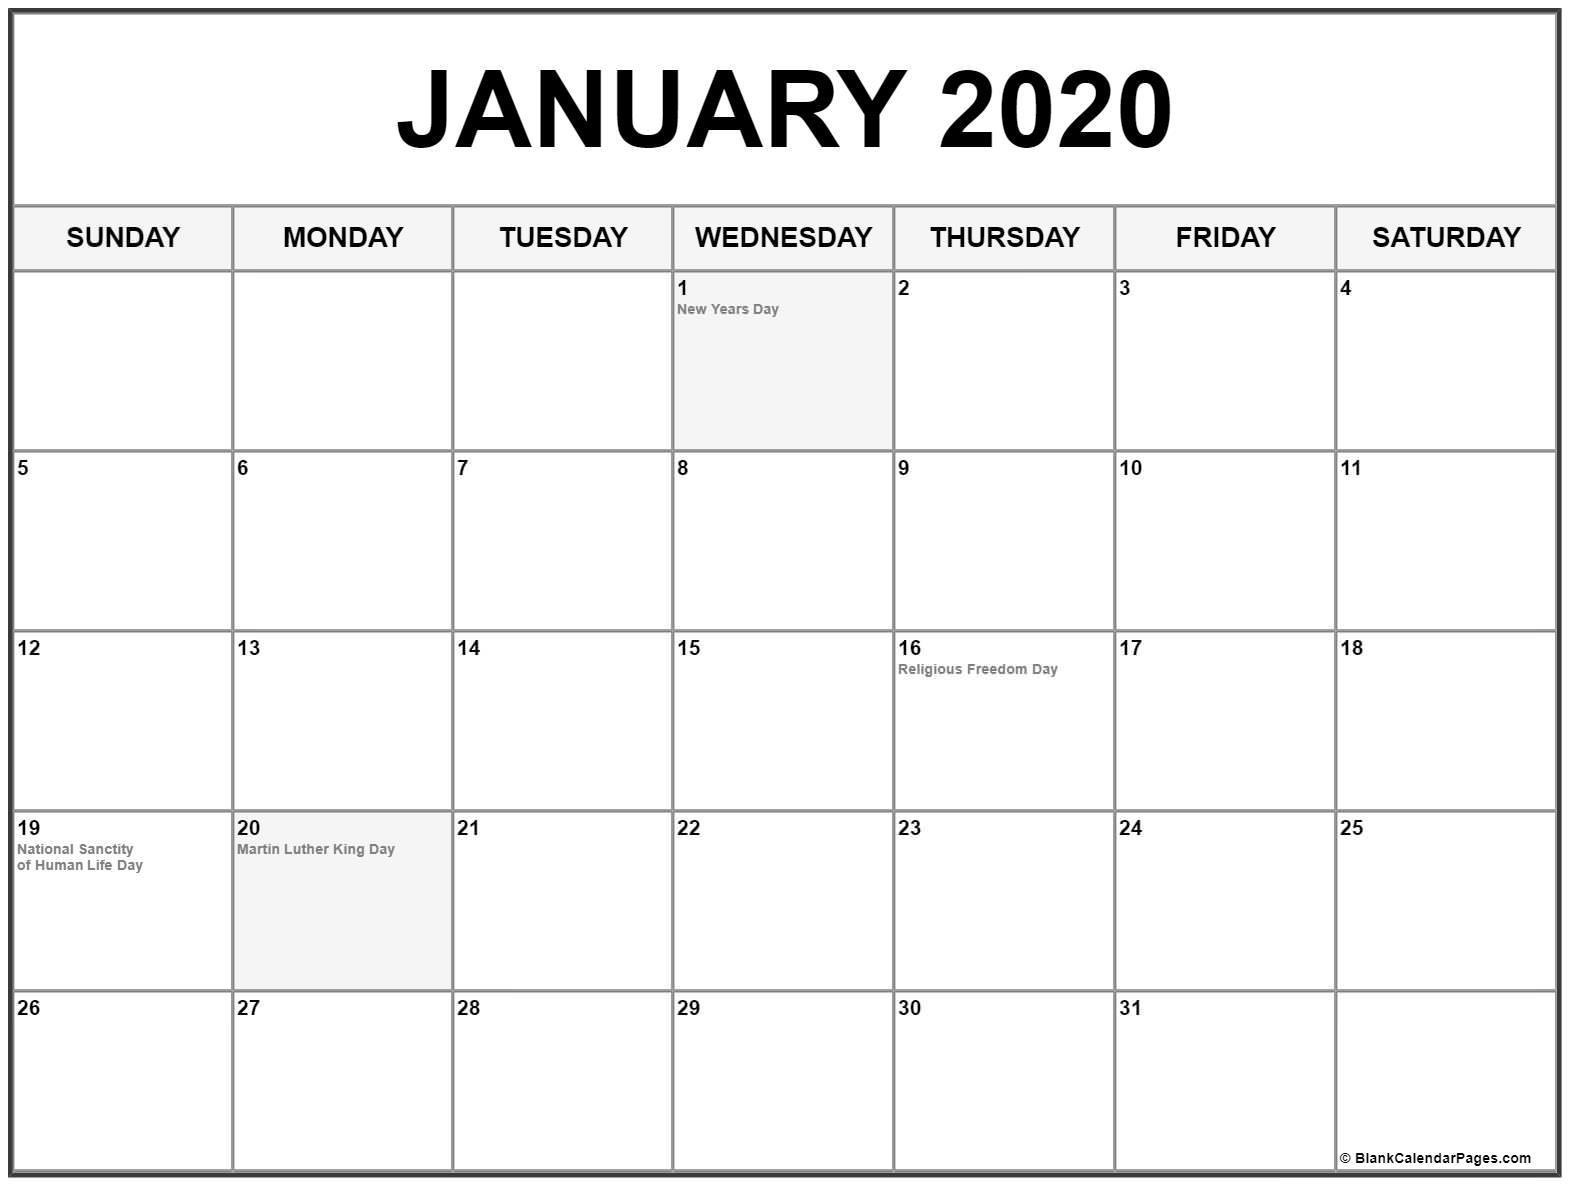 January 2020 Calendar With Holidays | Printable Calendar Exceptional 2020 Calendar Showing Holidays